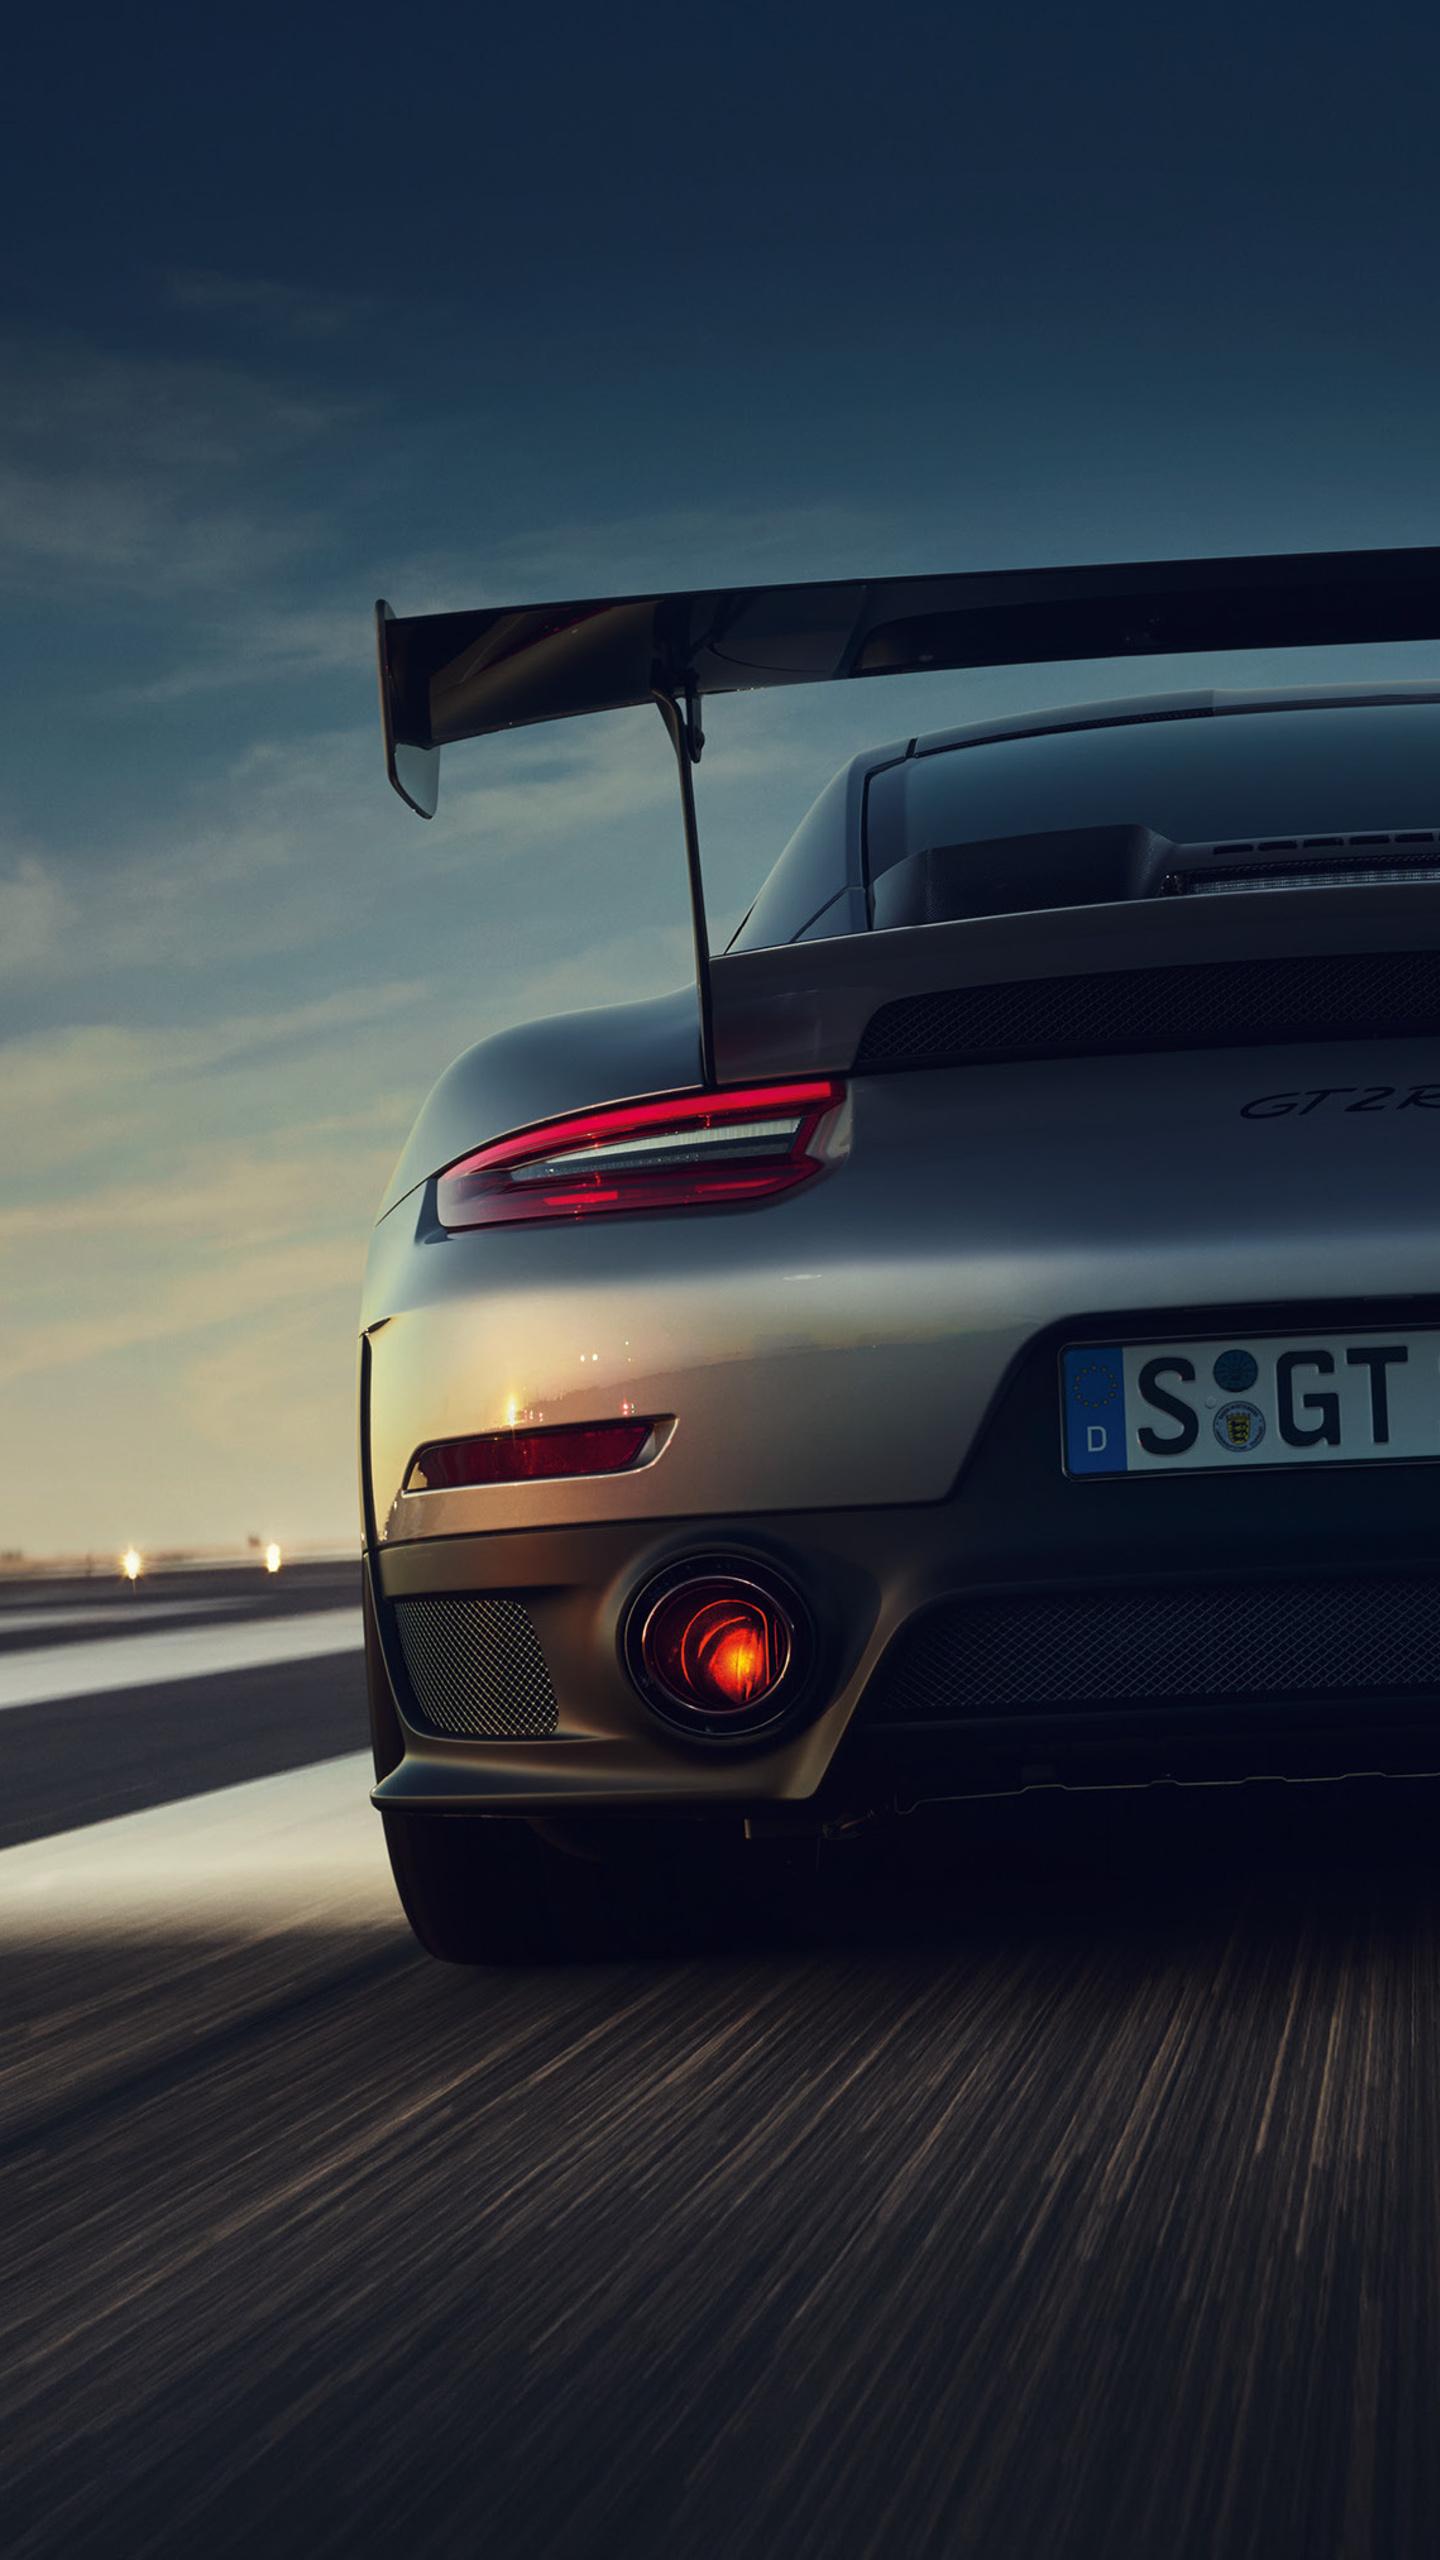 1440x2560 2018 Porsche 911 Gt2rs Samsung Galaxy S6 S7 Google Pixel